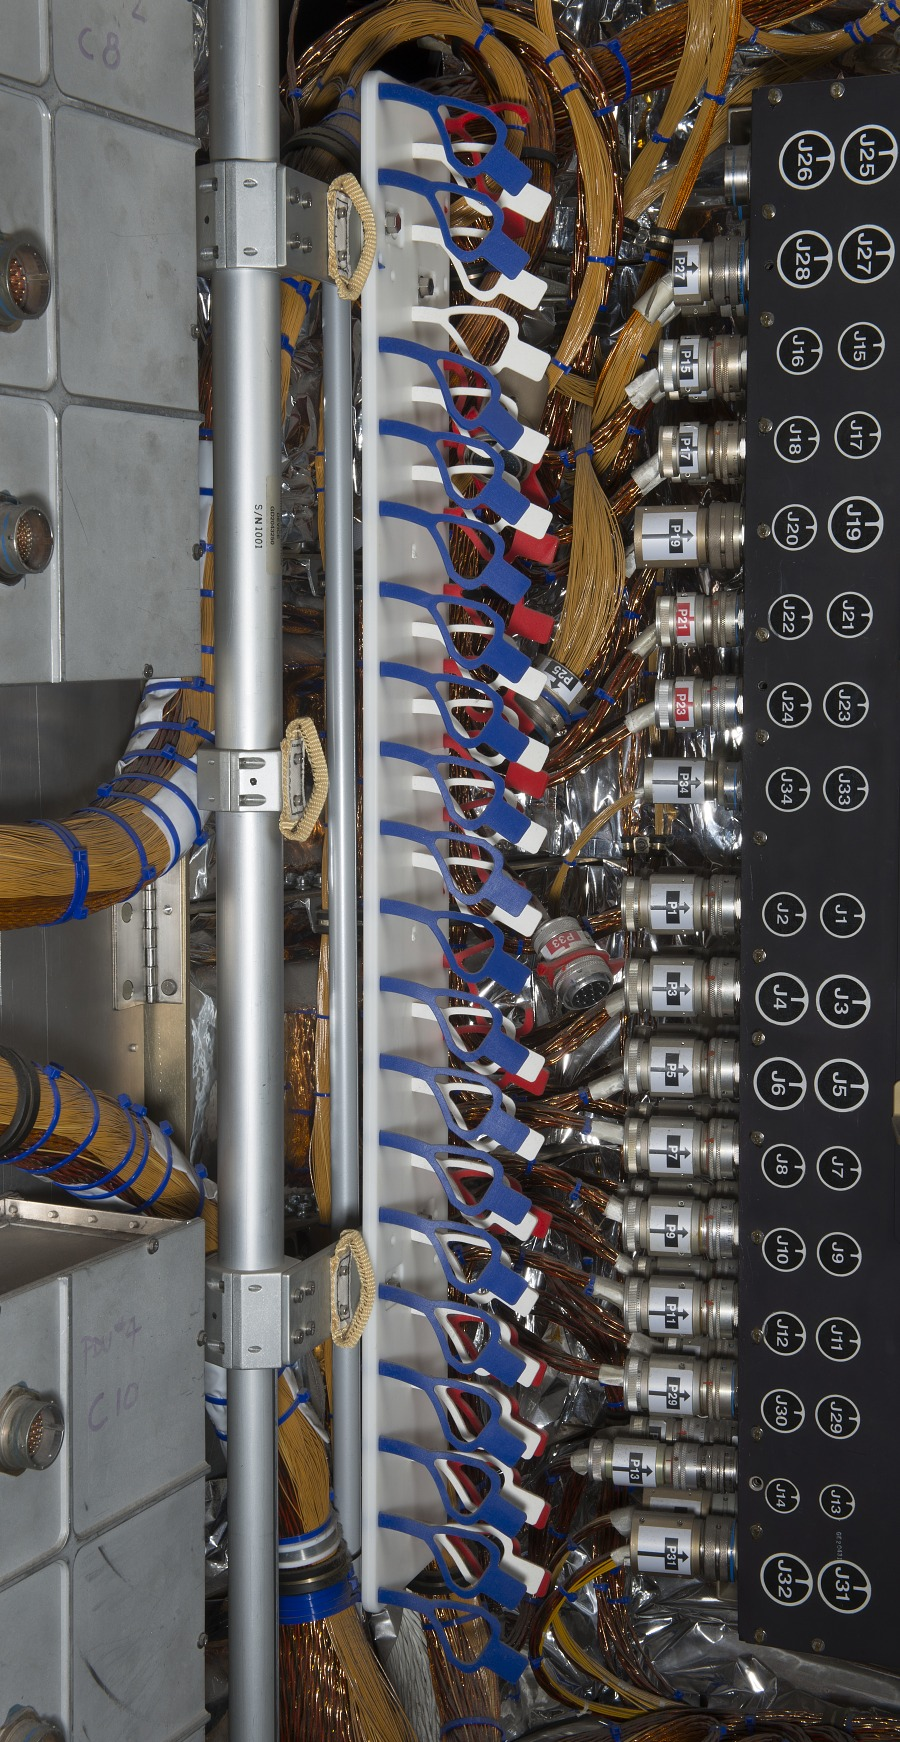 Tool, Restraint Harness, Power Control Unit Trainer